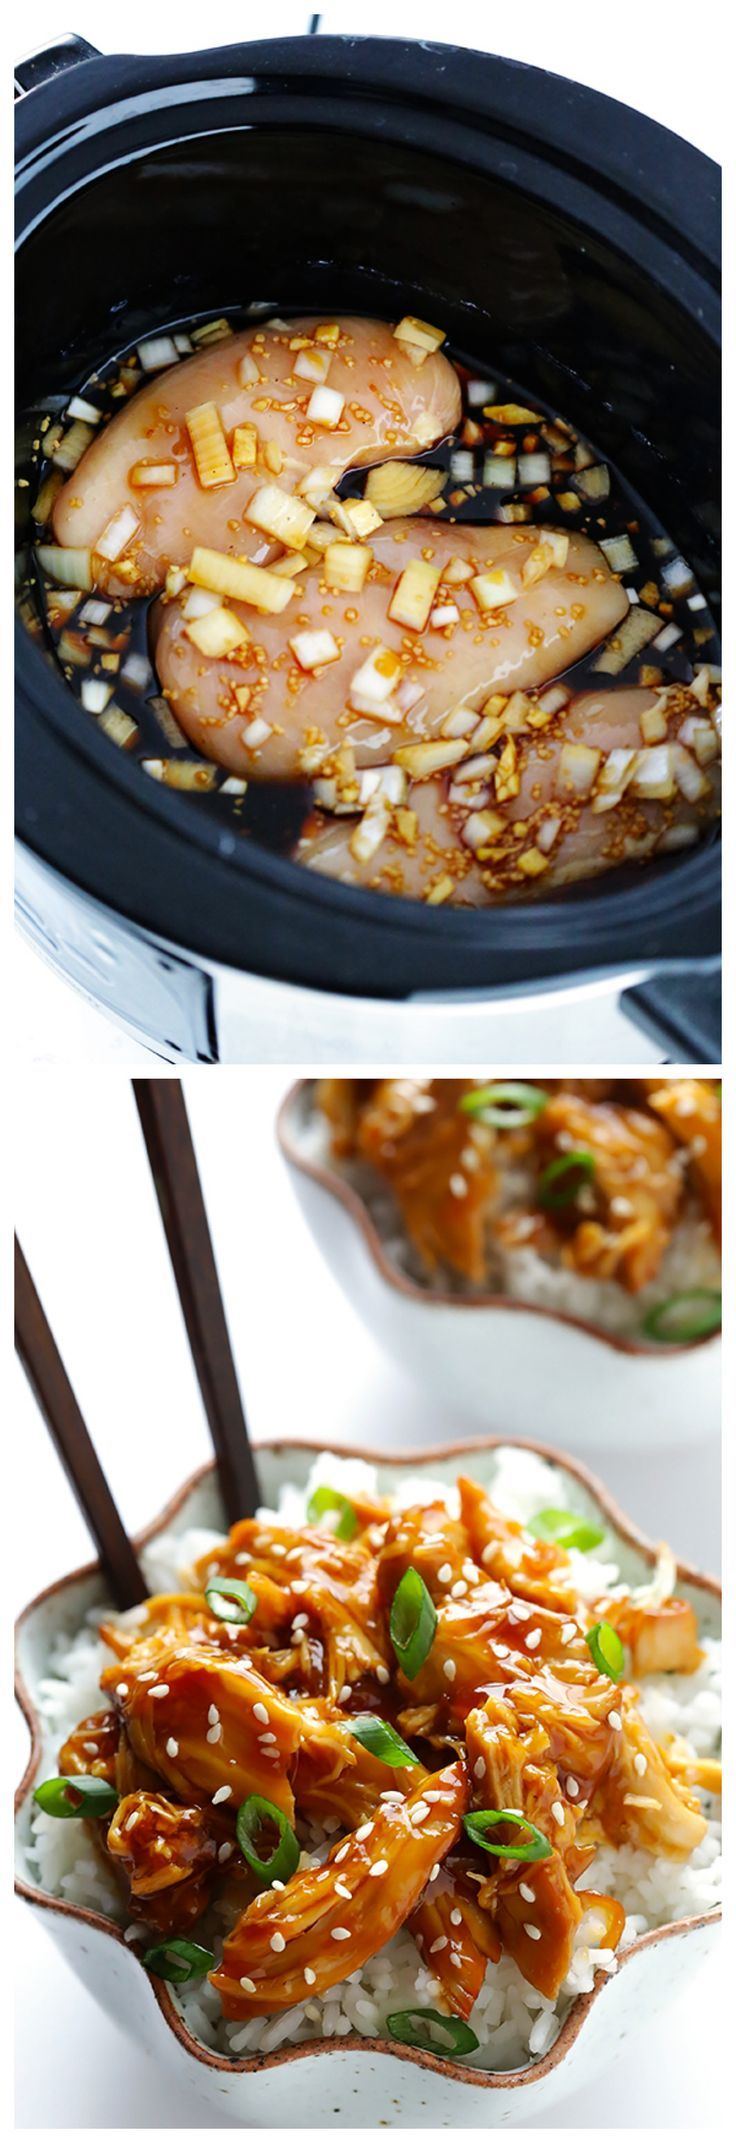 Slow Cooker Teriyaki Chicken #slowcooker #teriyaki #chicken